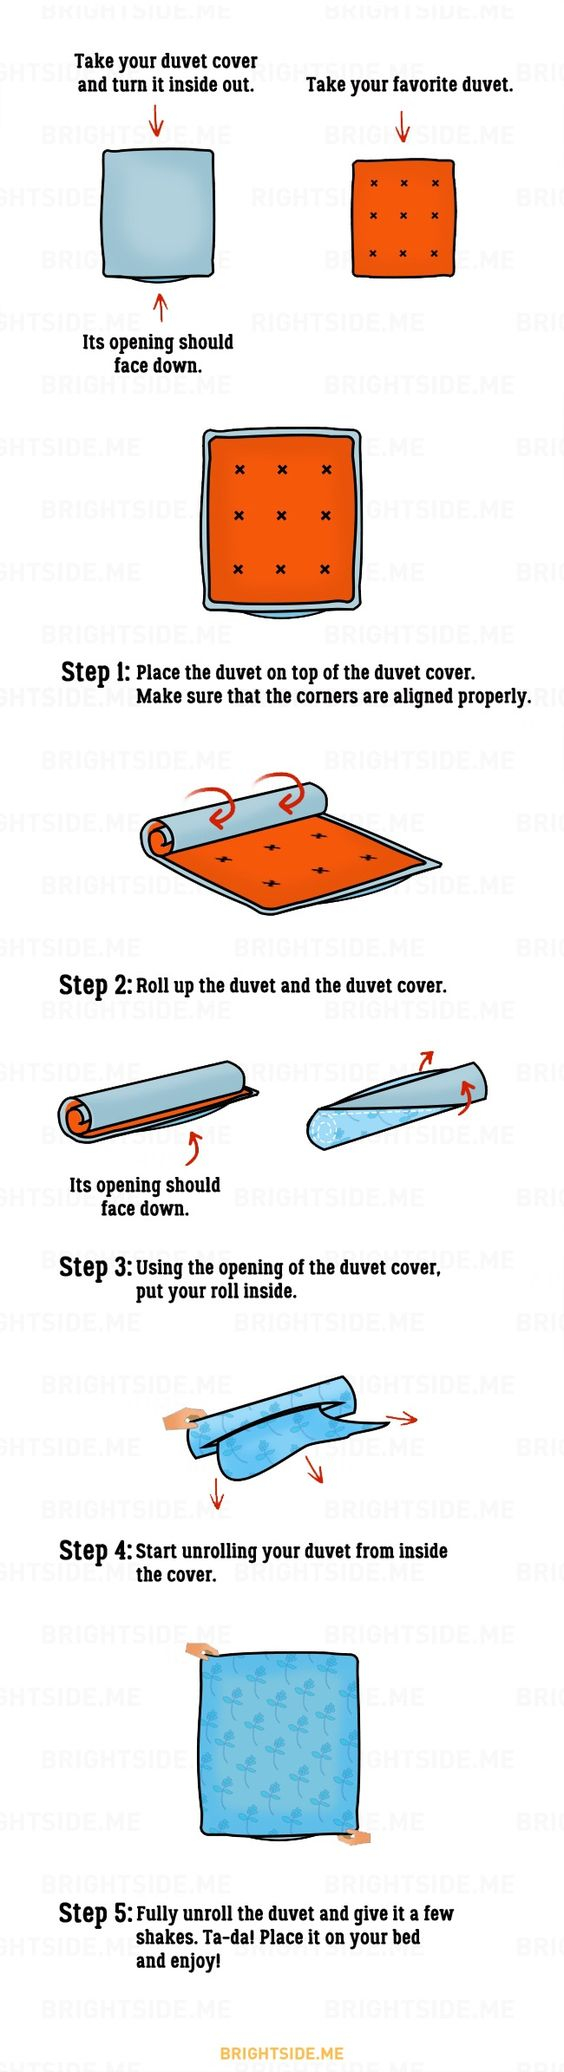 Asurprisingly easy way toput onaduvet cover